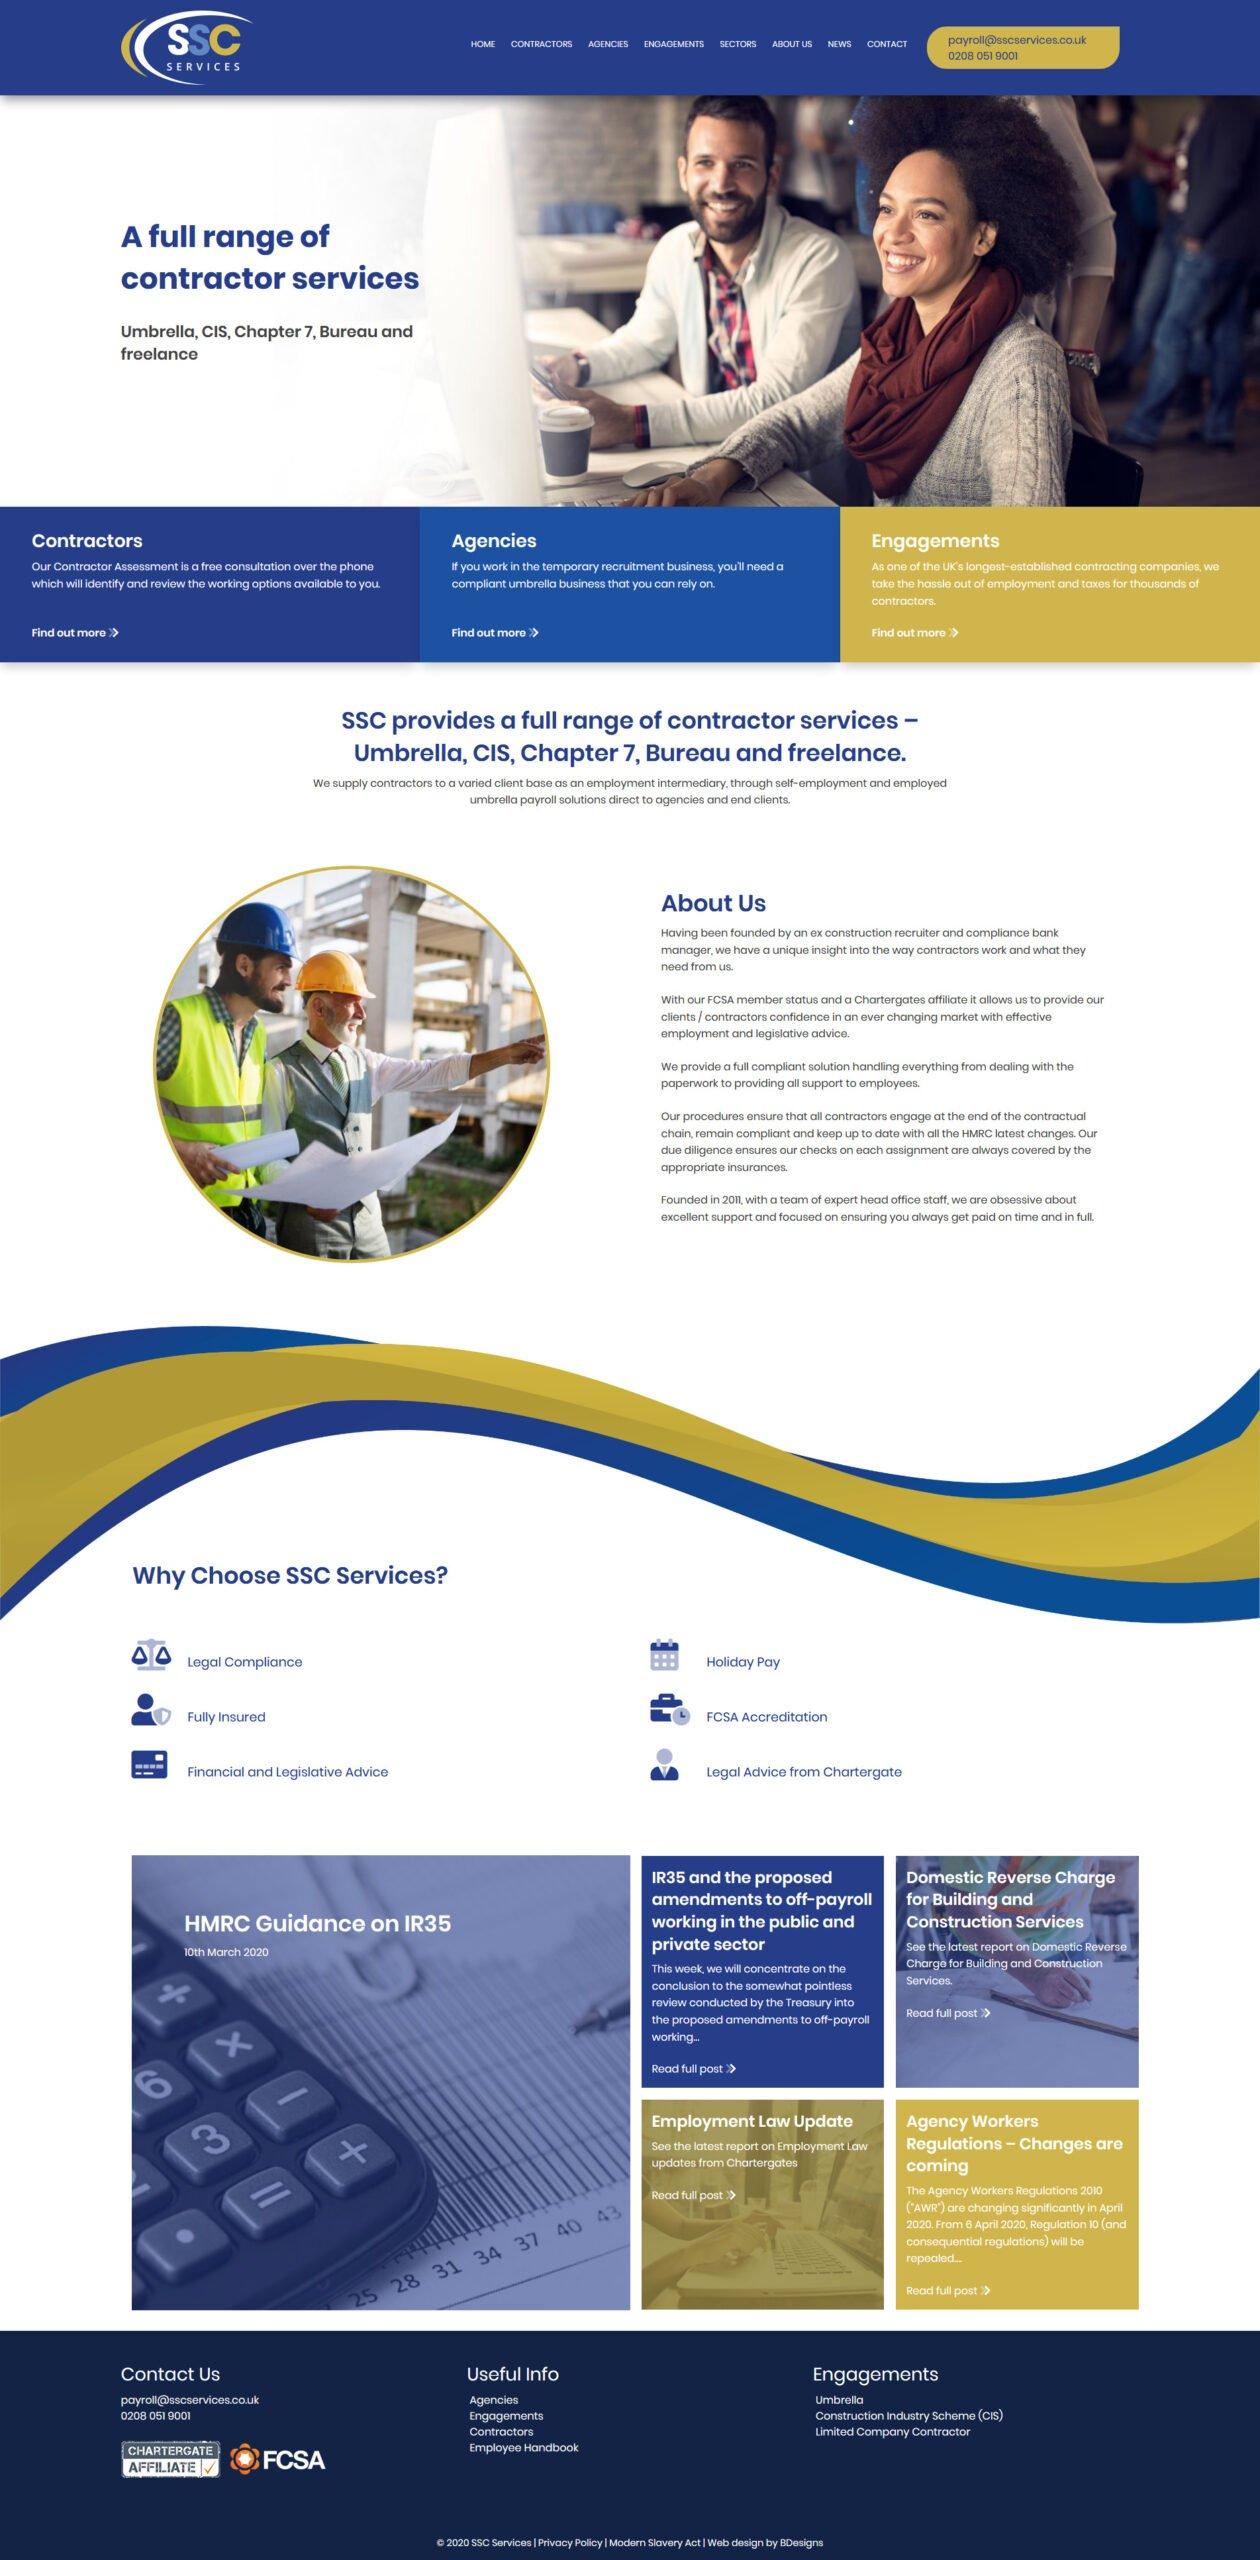 SSC Services Umbrella, CIS, Chapter 7, Bureau and freelance